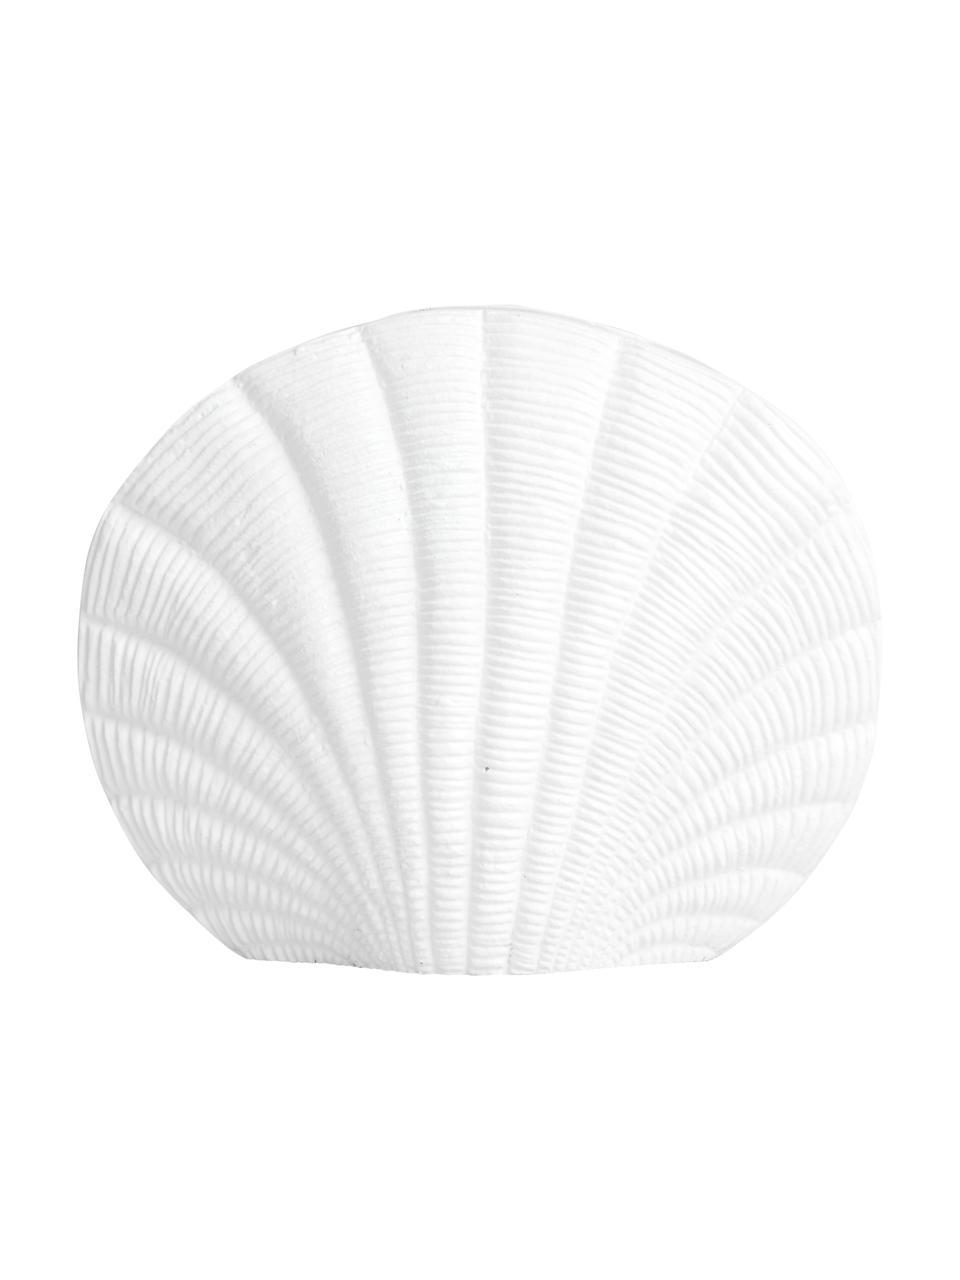 Vase Kapiti, Aluminium, beschichtet, Weiß, 23 x 23 cm